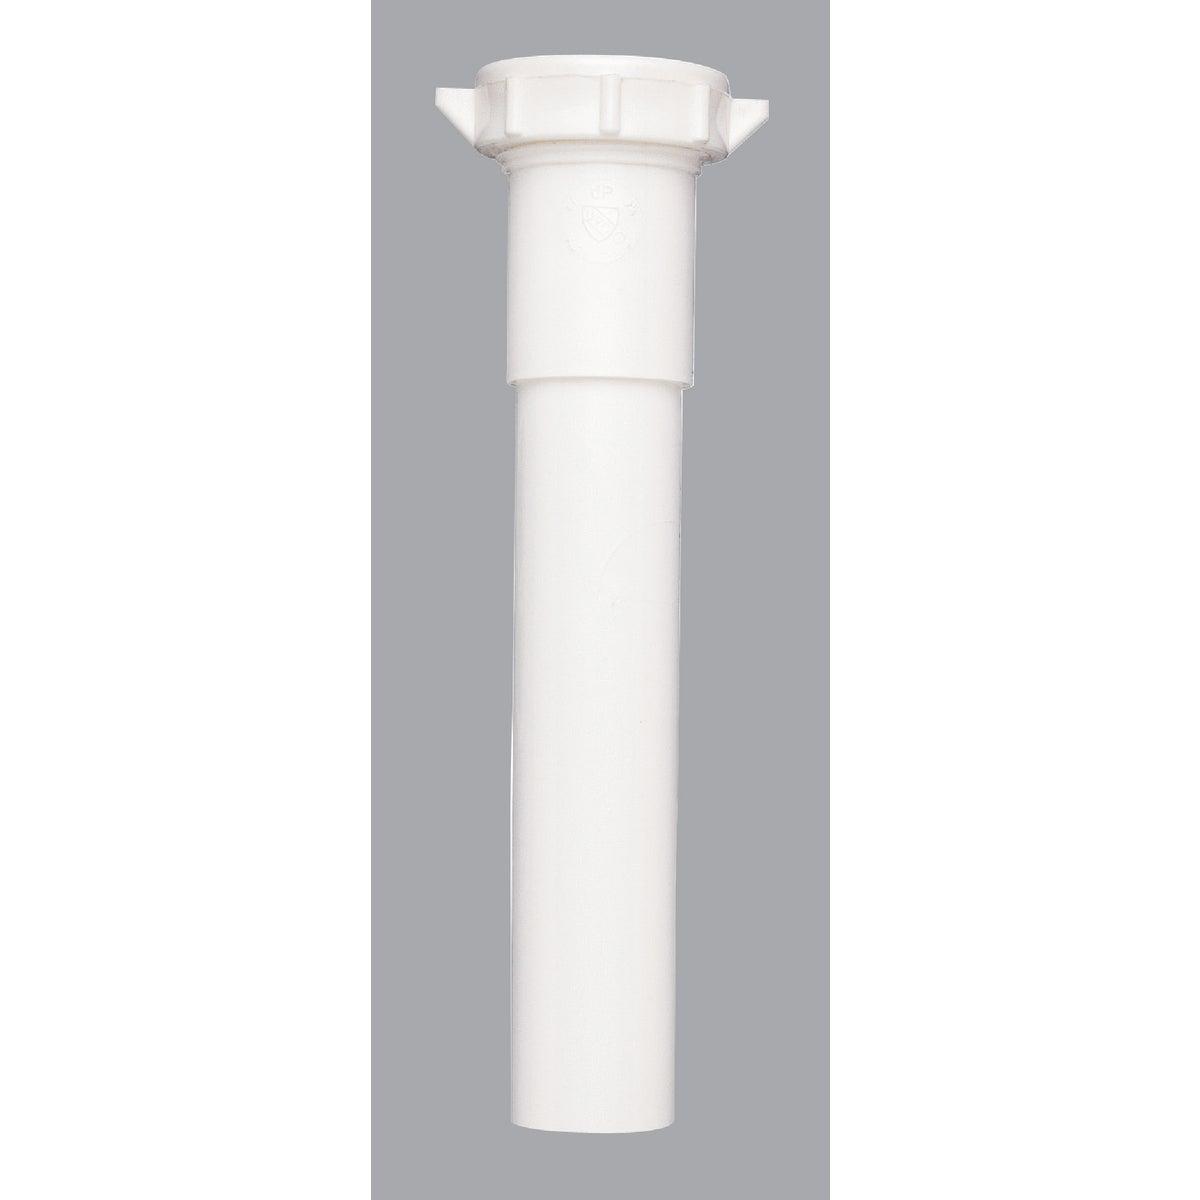 Plumb Pak/Keeney Mfg. 1-1/2X6 WHT S/J EXT TUBE 40-6WK